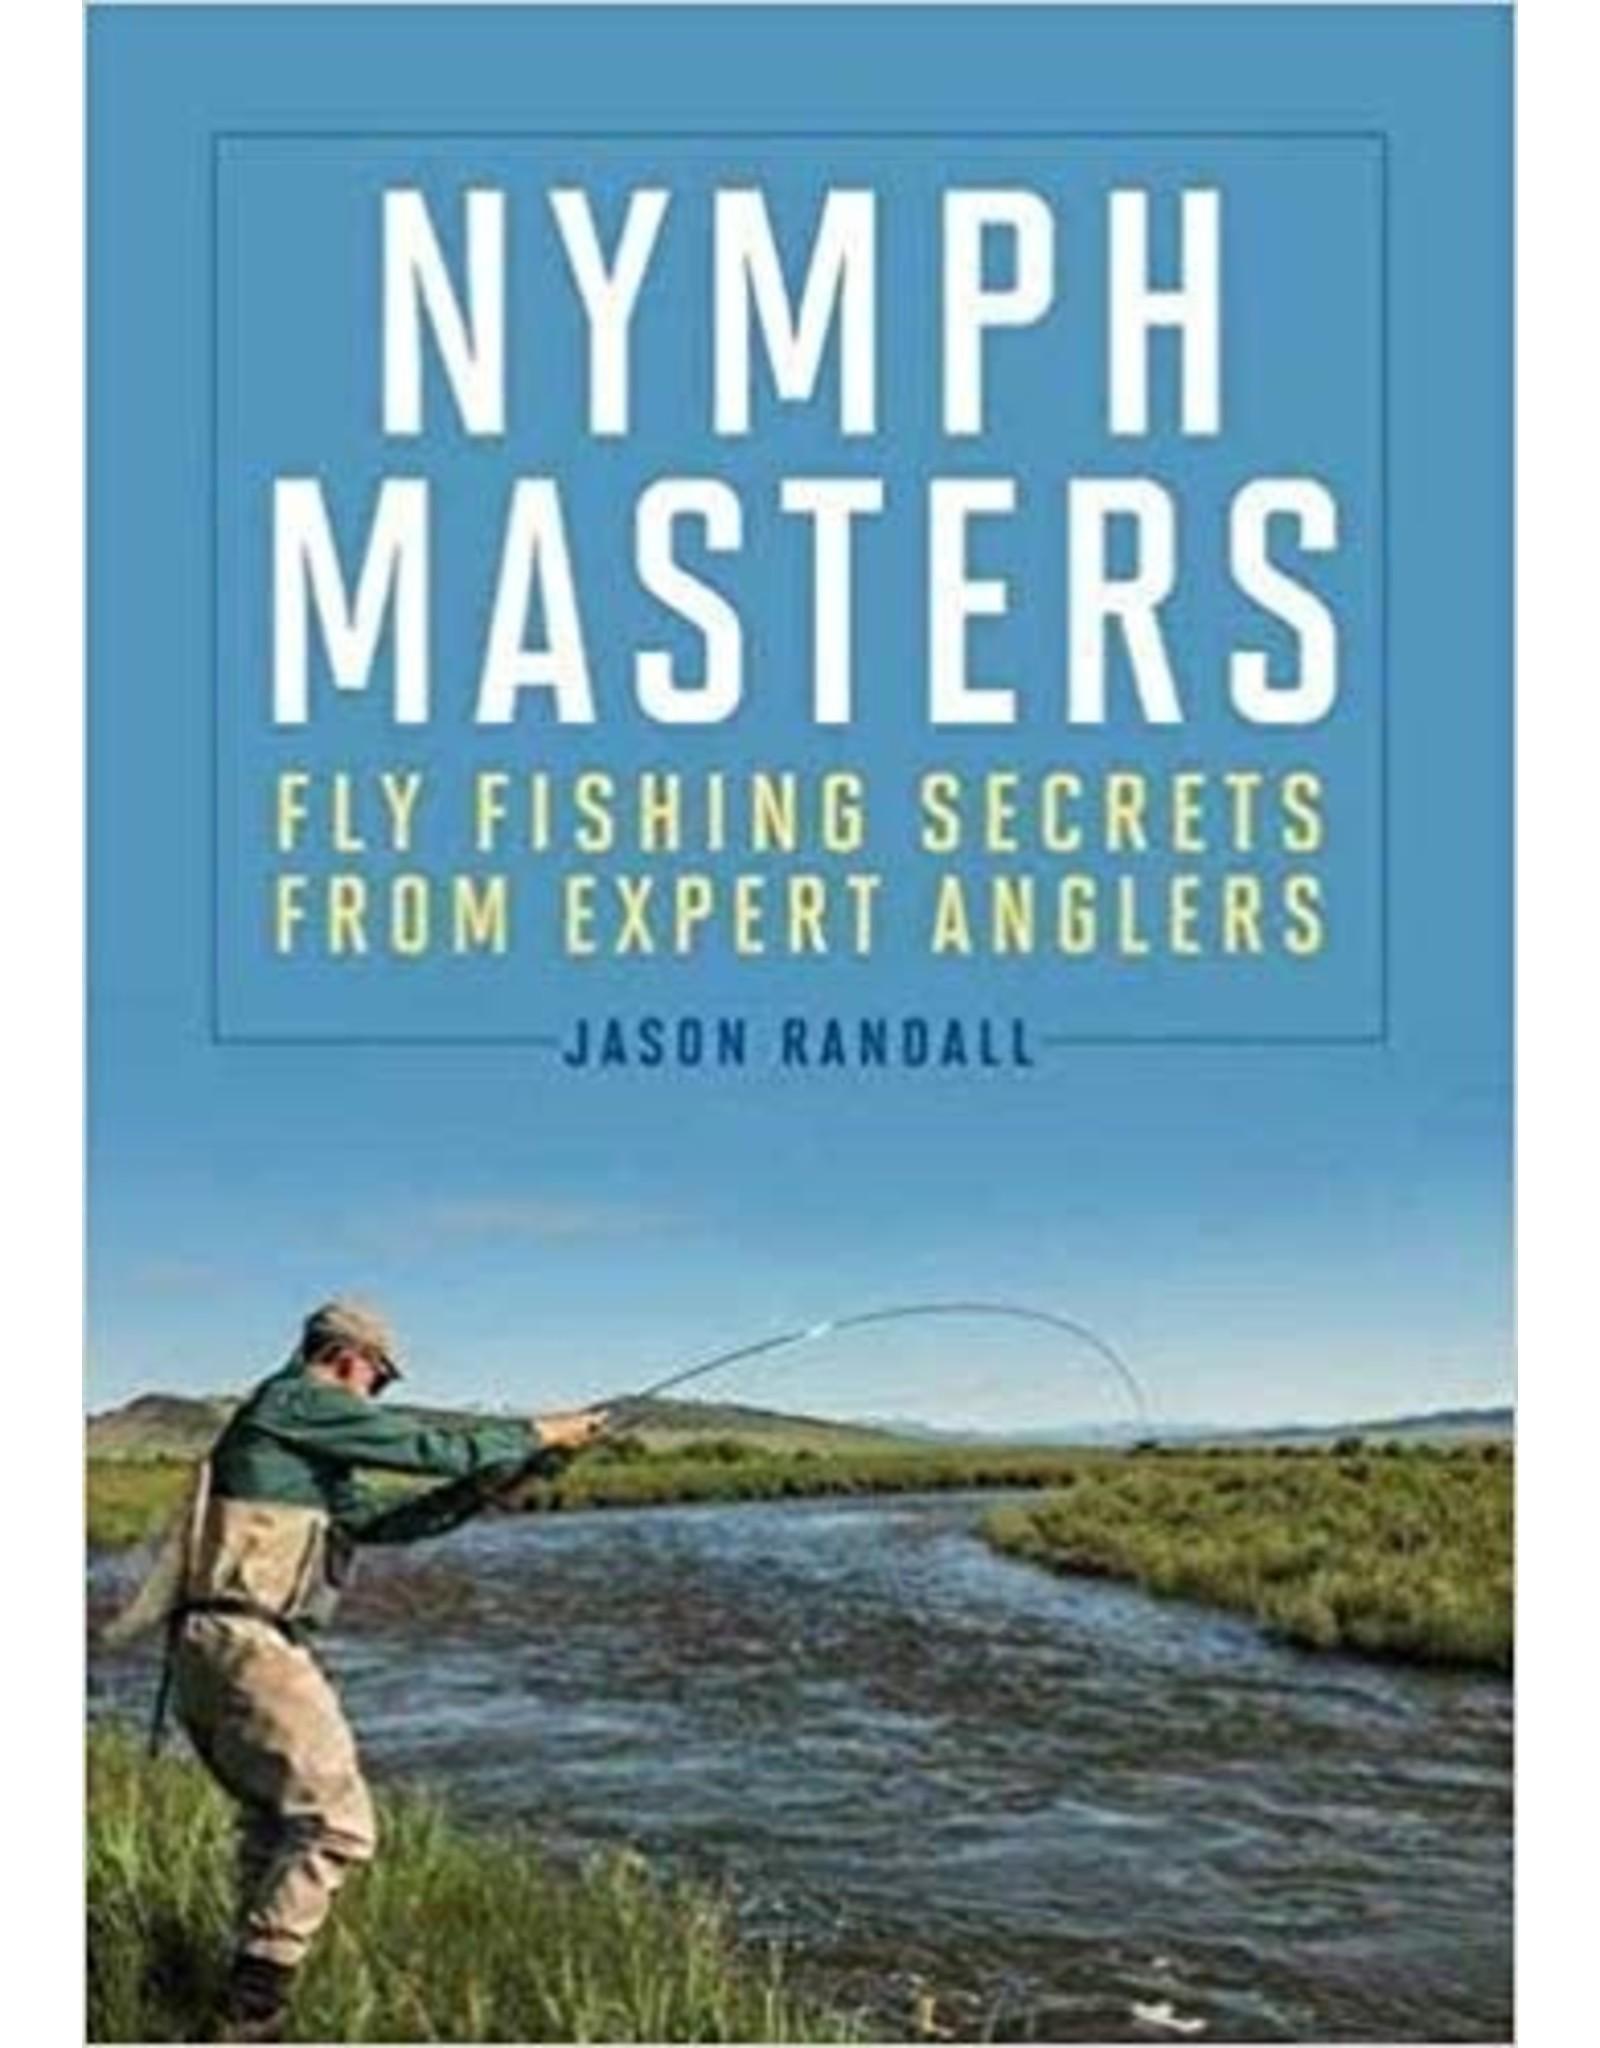 Nymph Masters by Jason Randall